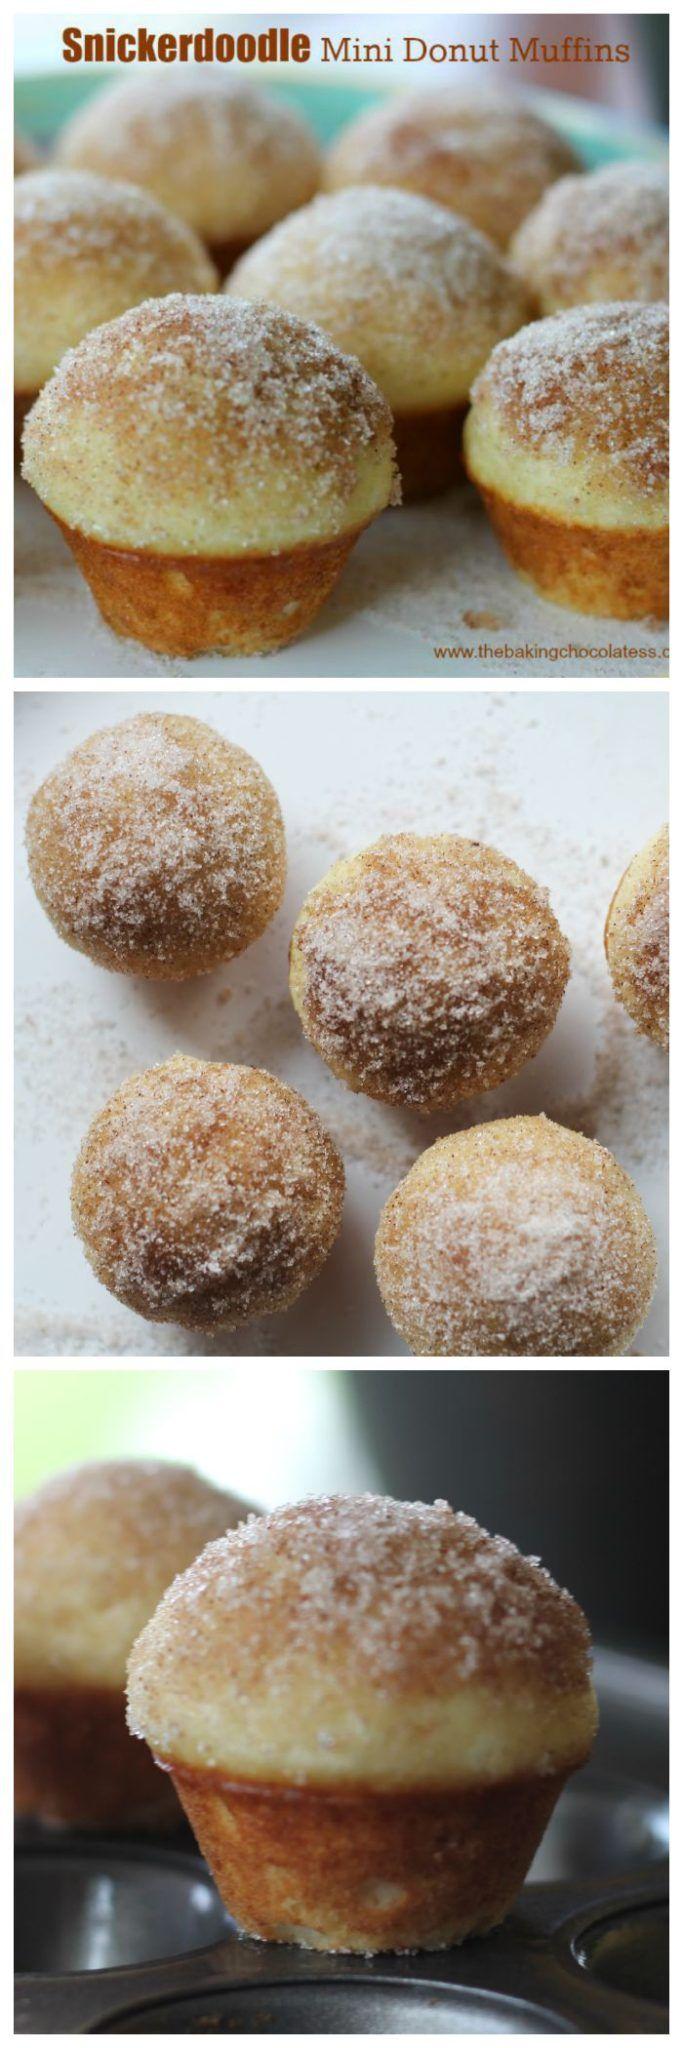 Snickerdoodle Mini Donut Muffins via @https://www.pinterest.com/BaknChocolaTess/